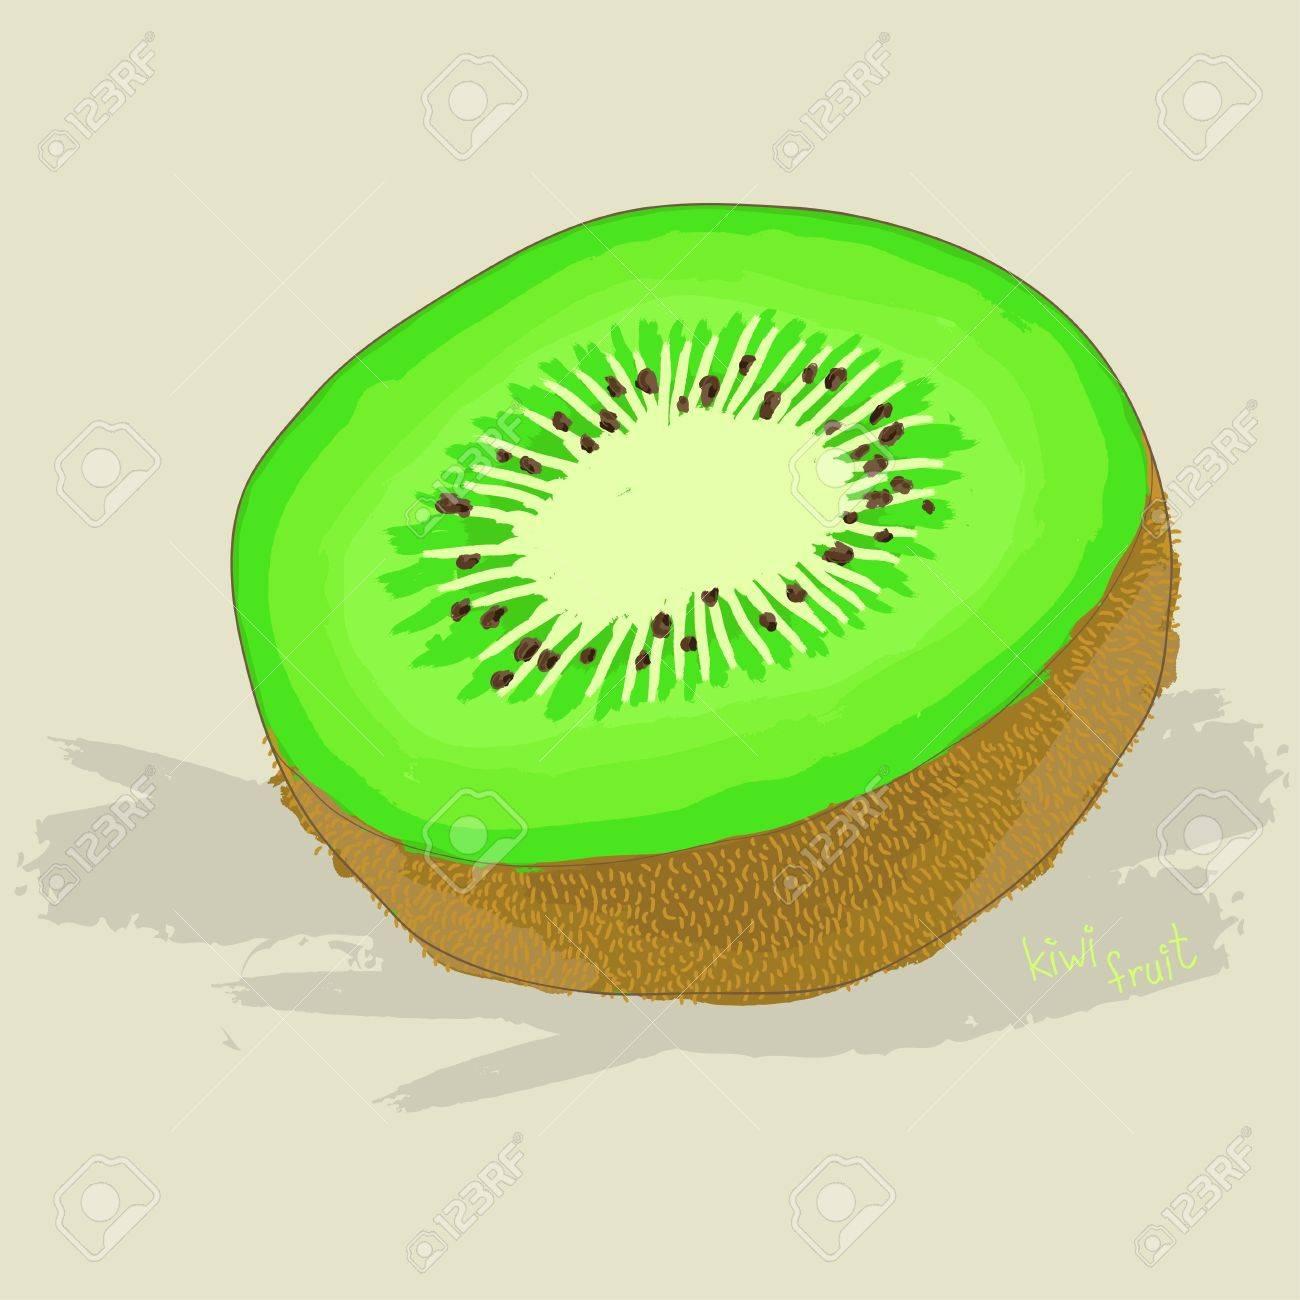 Kiwi Fruit Sketch Hand Drawn Fresh Kiwi Fruit